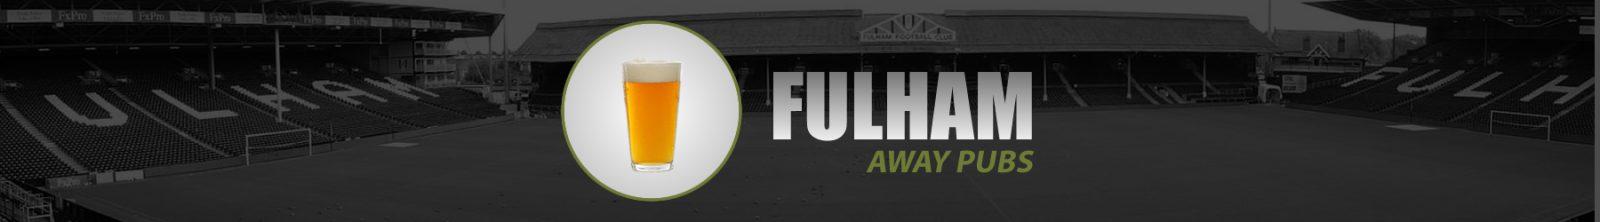 Fulham Away Pubs